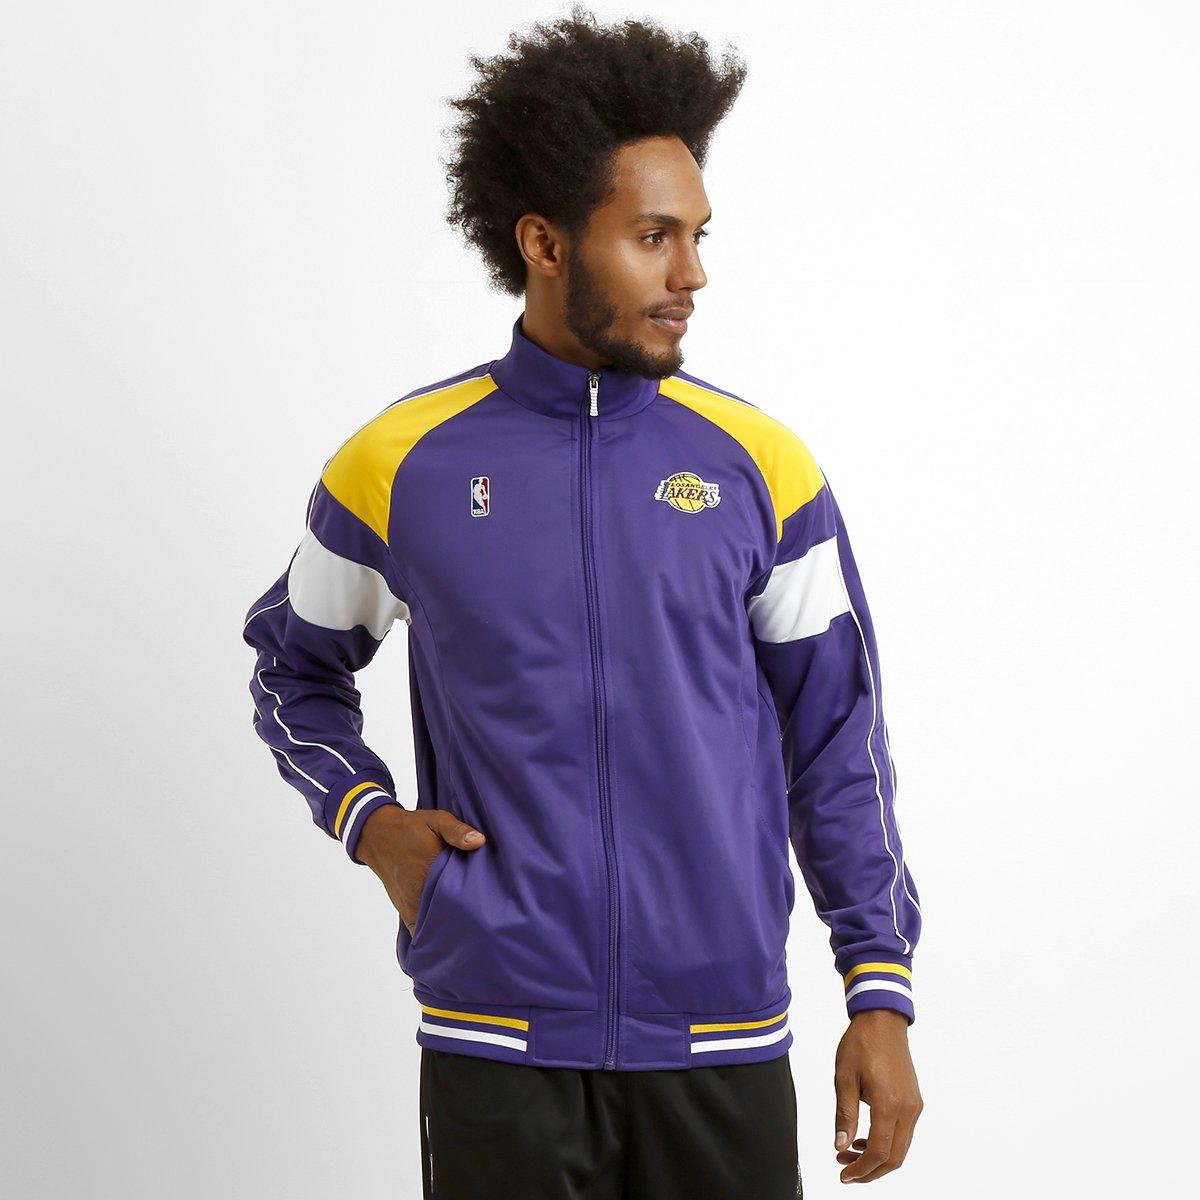 Jaqueta NBA Performance Los Angeles Lakers - Compre Agora  6875a07c428